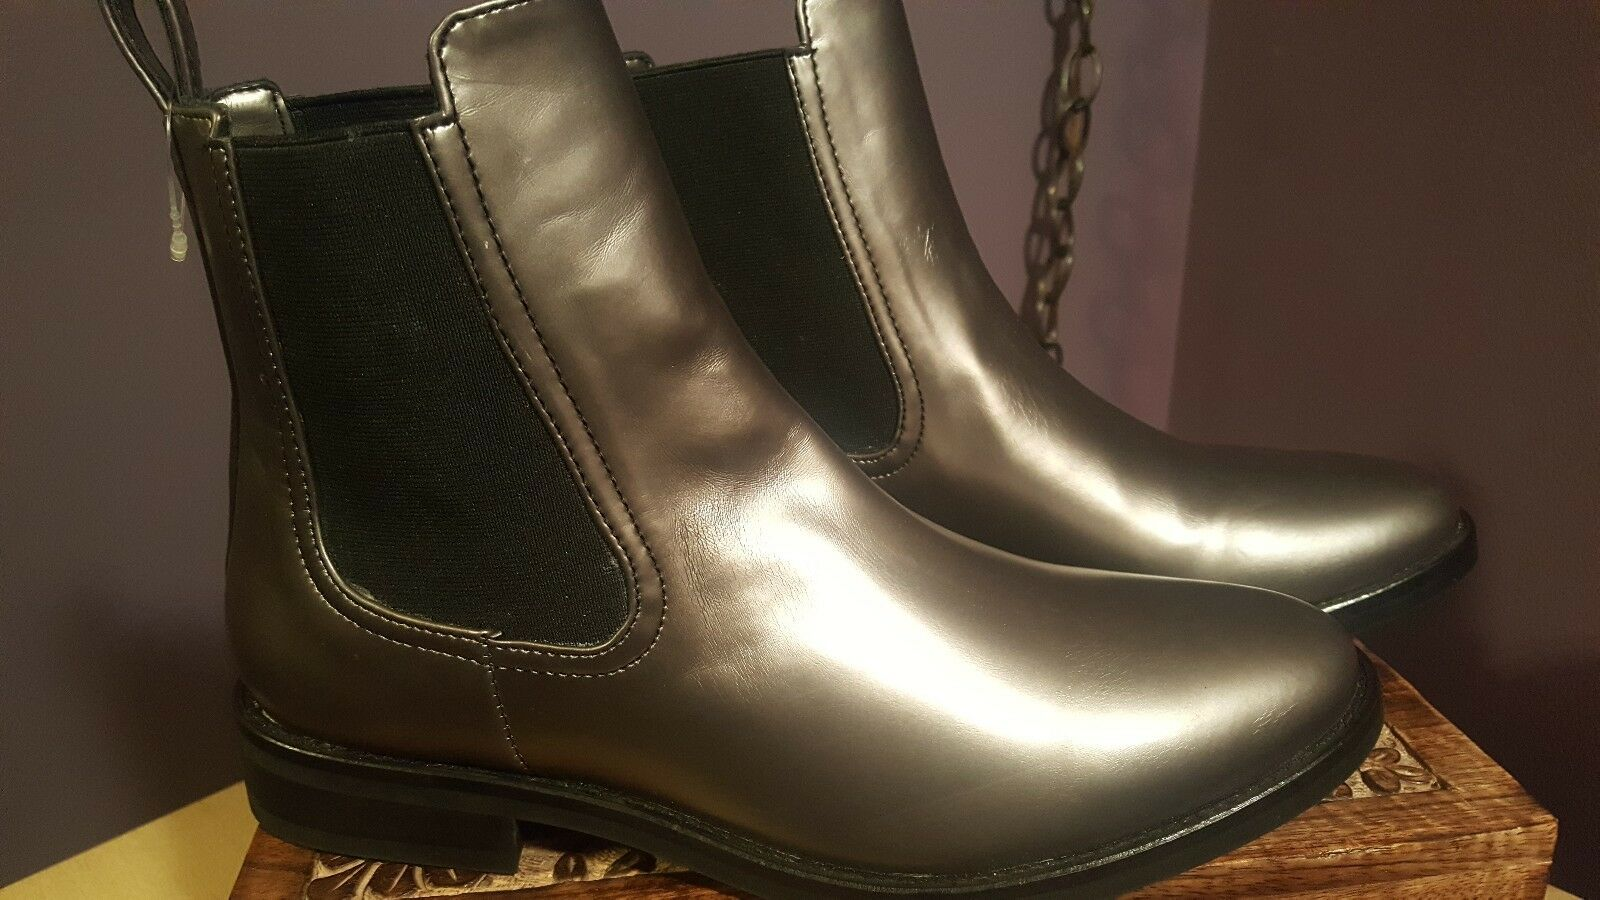 Thursday avvio Company Duchess donna's Chelsea metallic